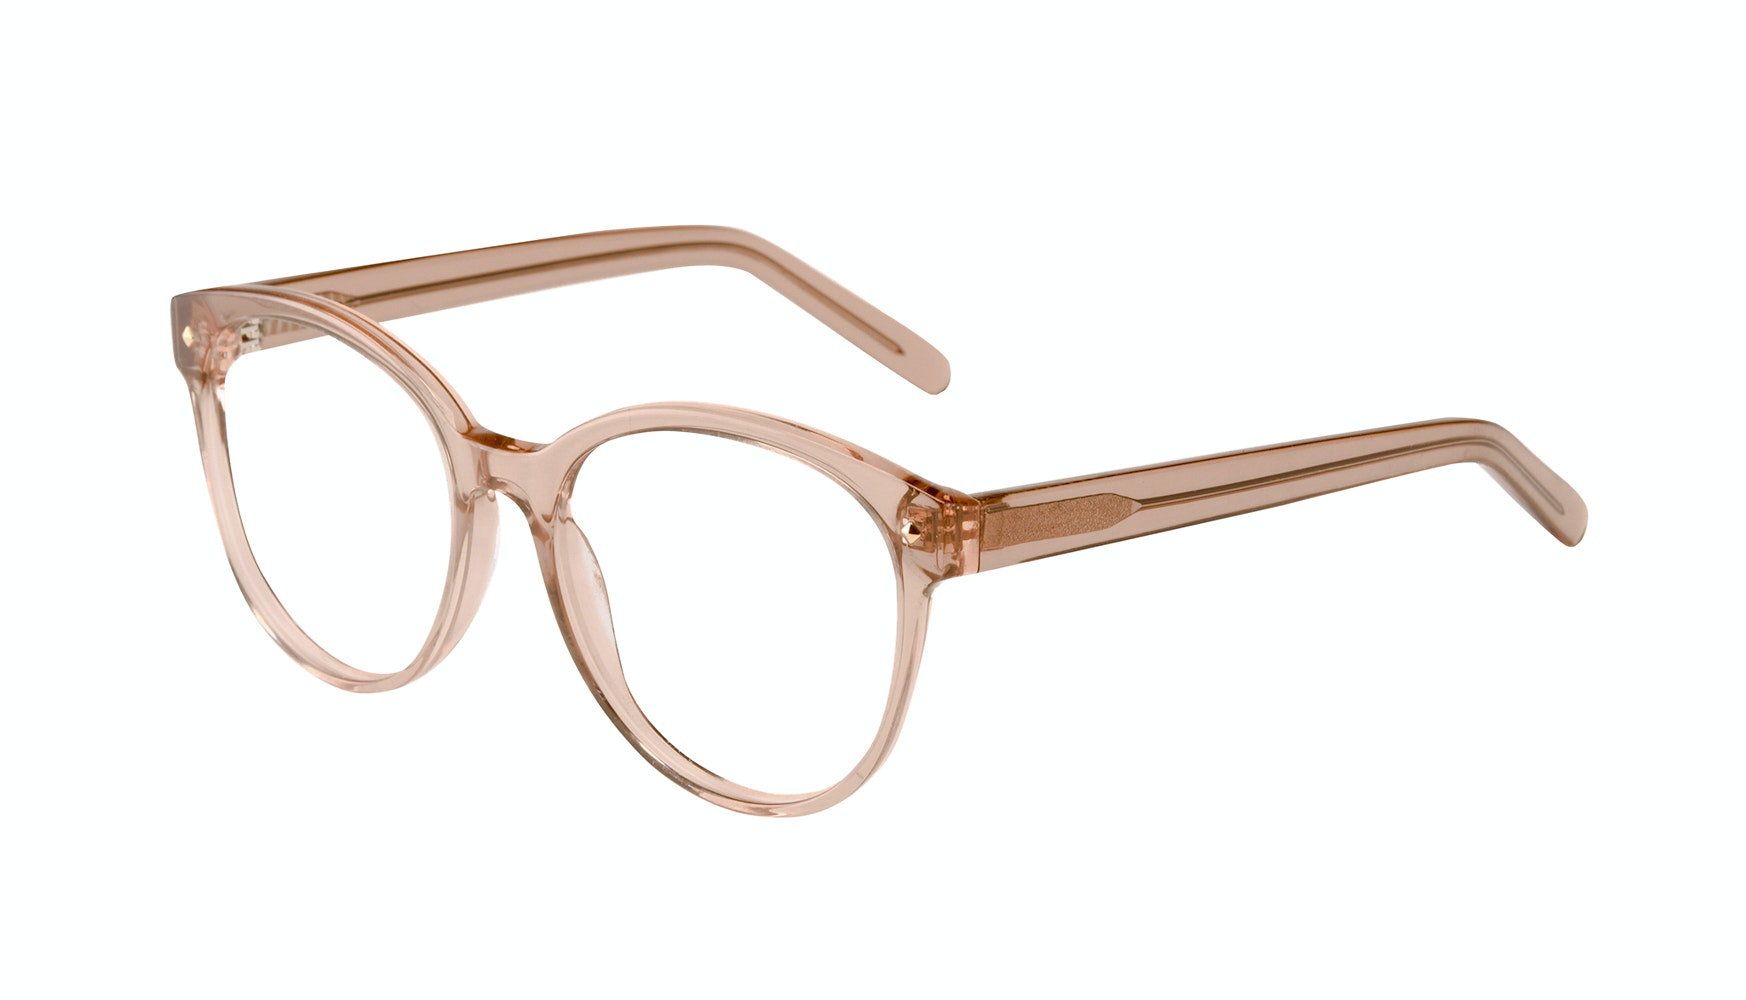 Affordable Fashion Glasses Cat Eye Round Eyeglasses Women Eclipse Toffee Tilt